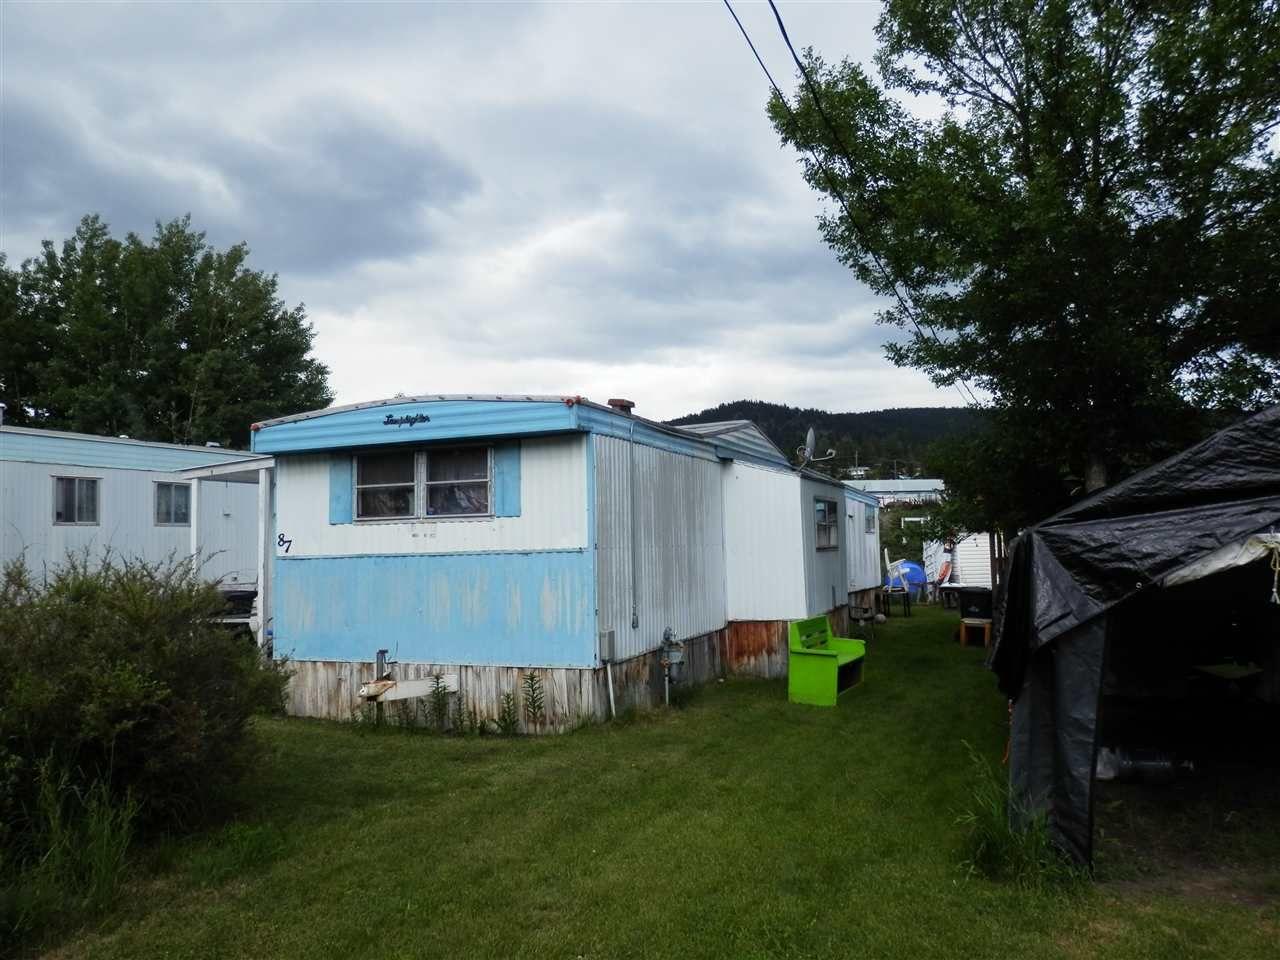 Photo 3: Photos: 87 3001 N MACKENZIE Avenue in Williams Lake: Williams Lake - City Manufactured Home for sale (Williams Lake (Zone 27))  : MLS®# R2379135